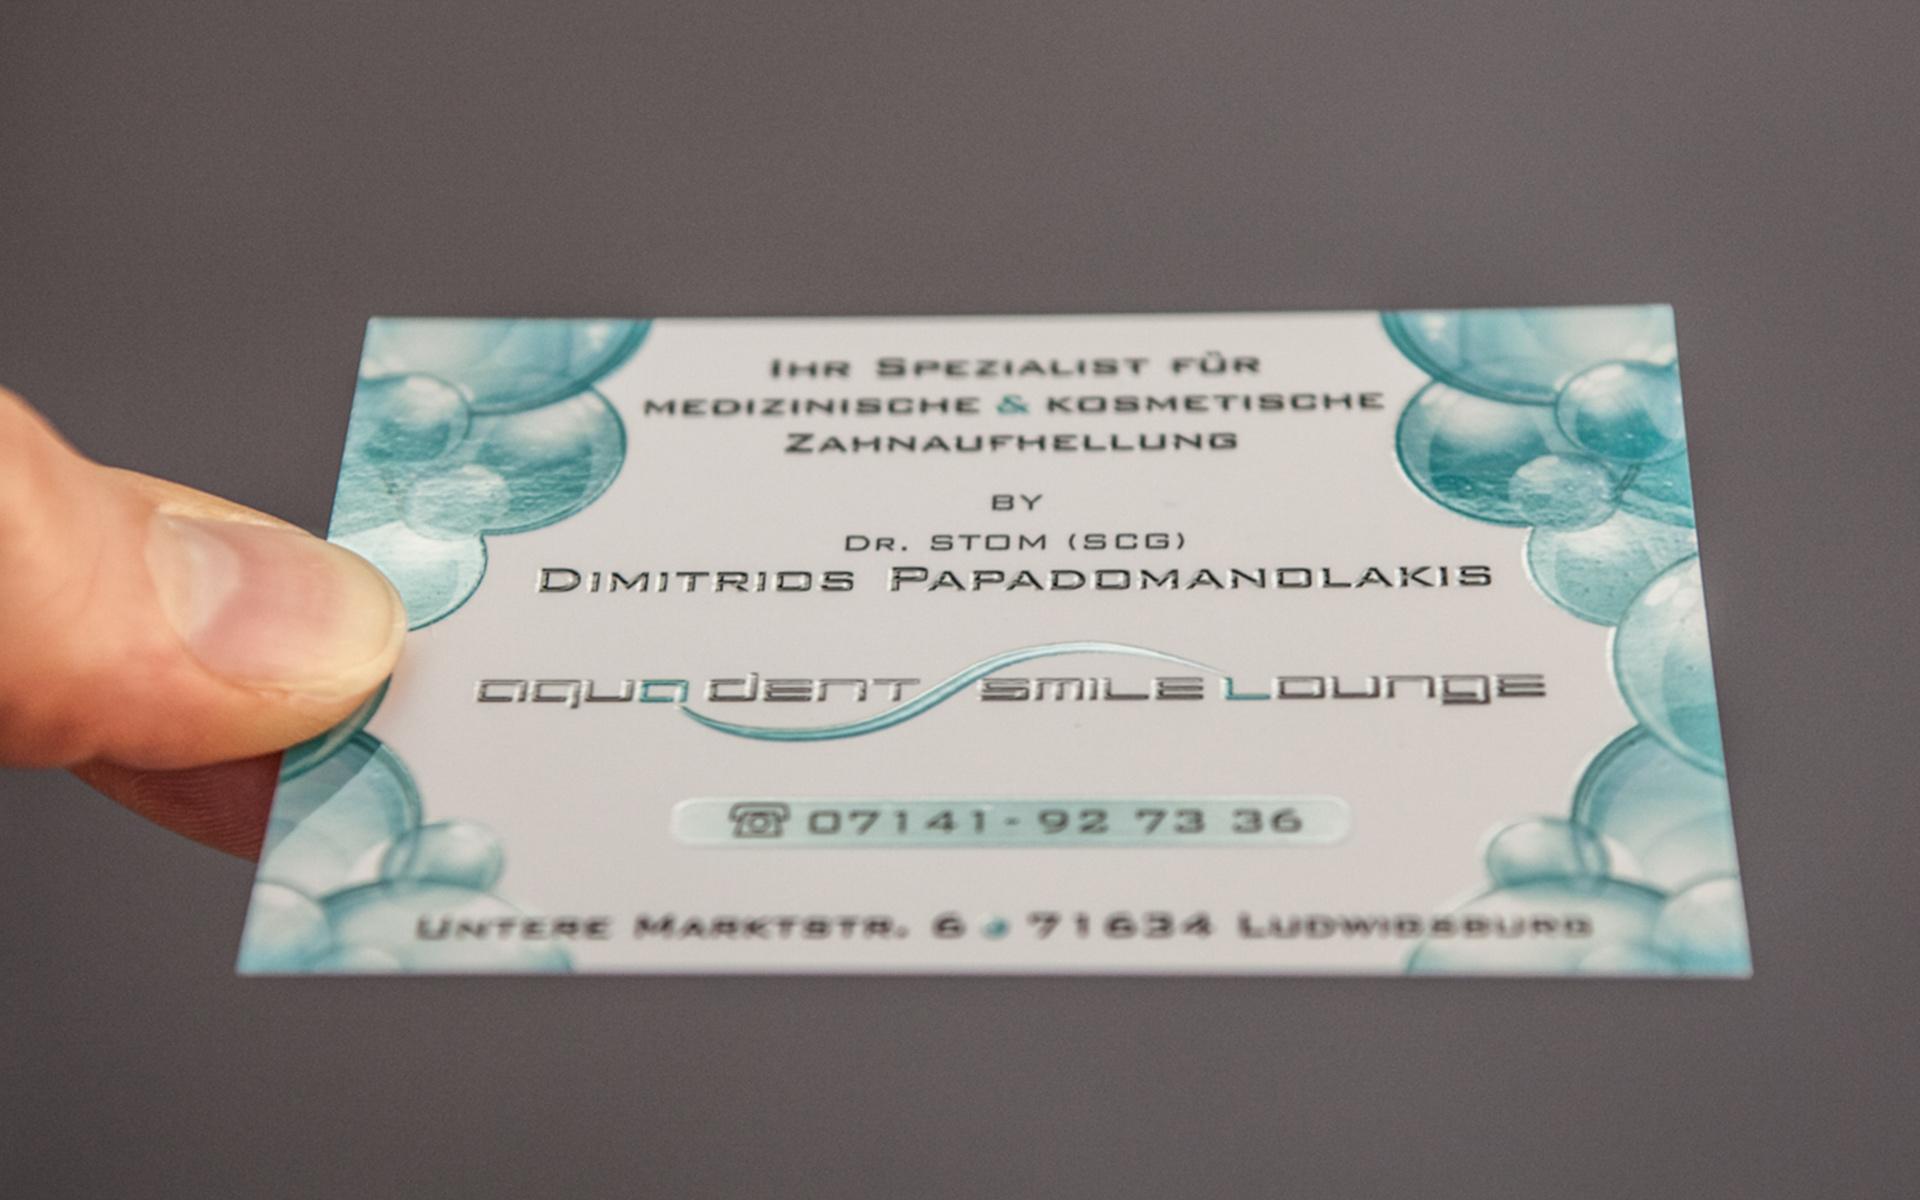 Arztpraxis Visitenkarte Druckveredelung Lack